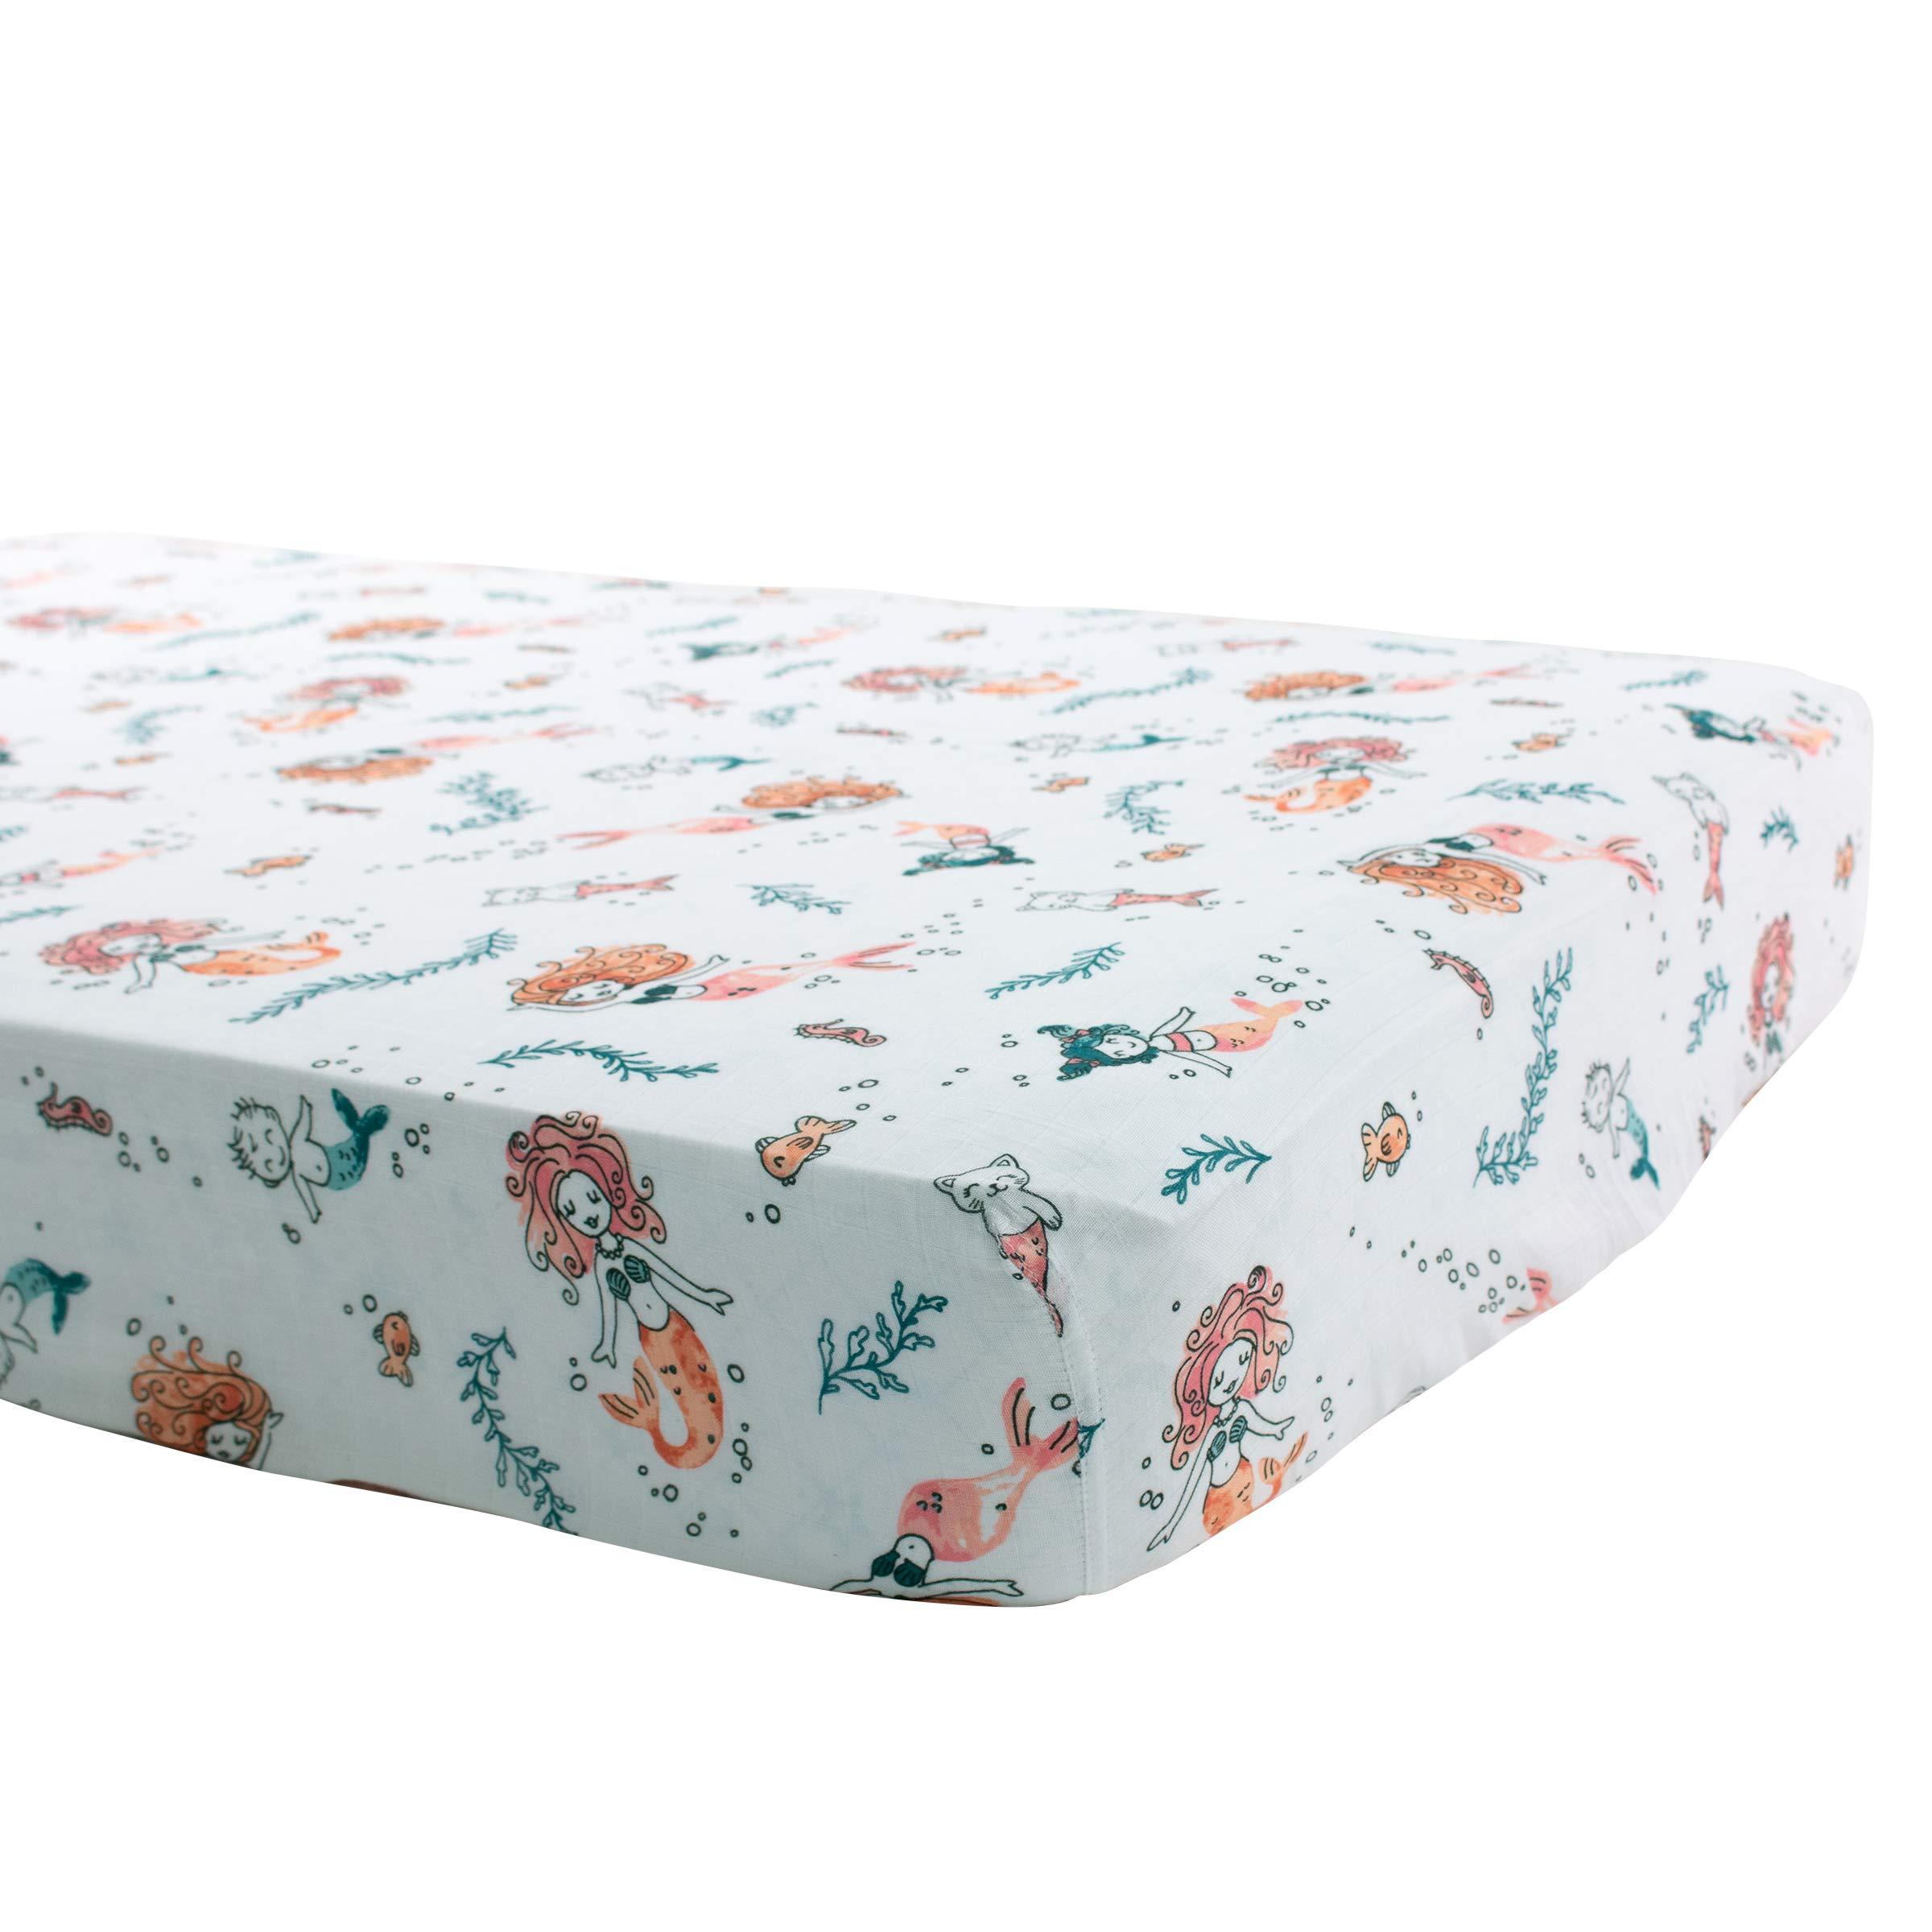 Bebe au Lait Oh So Soft Muslin Crib Sheet, Mermaids by Bebe au Lait